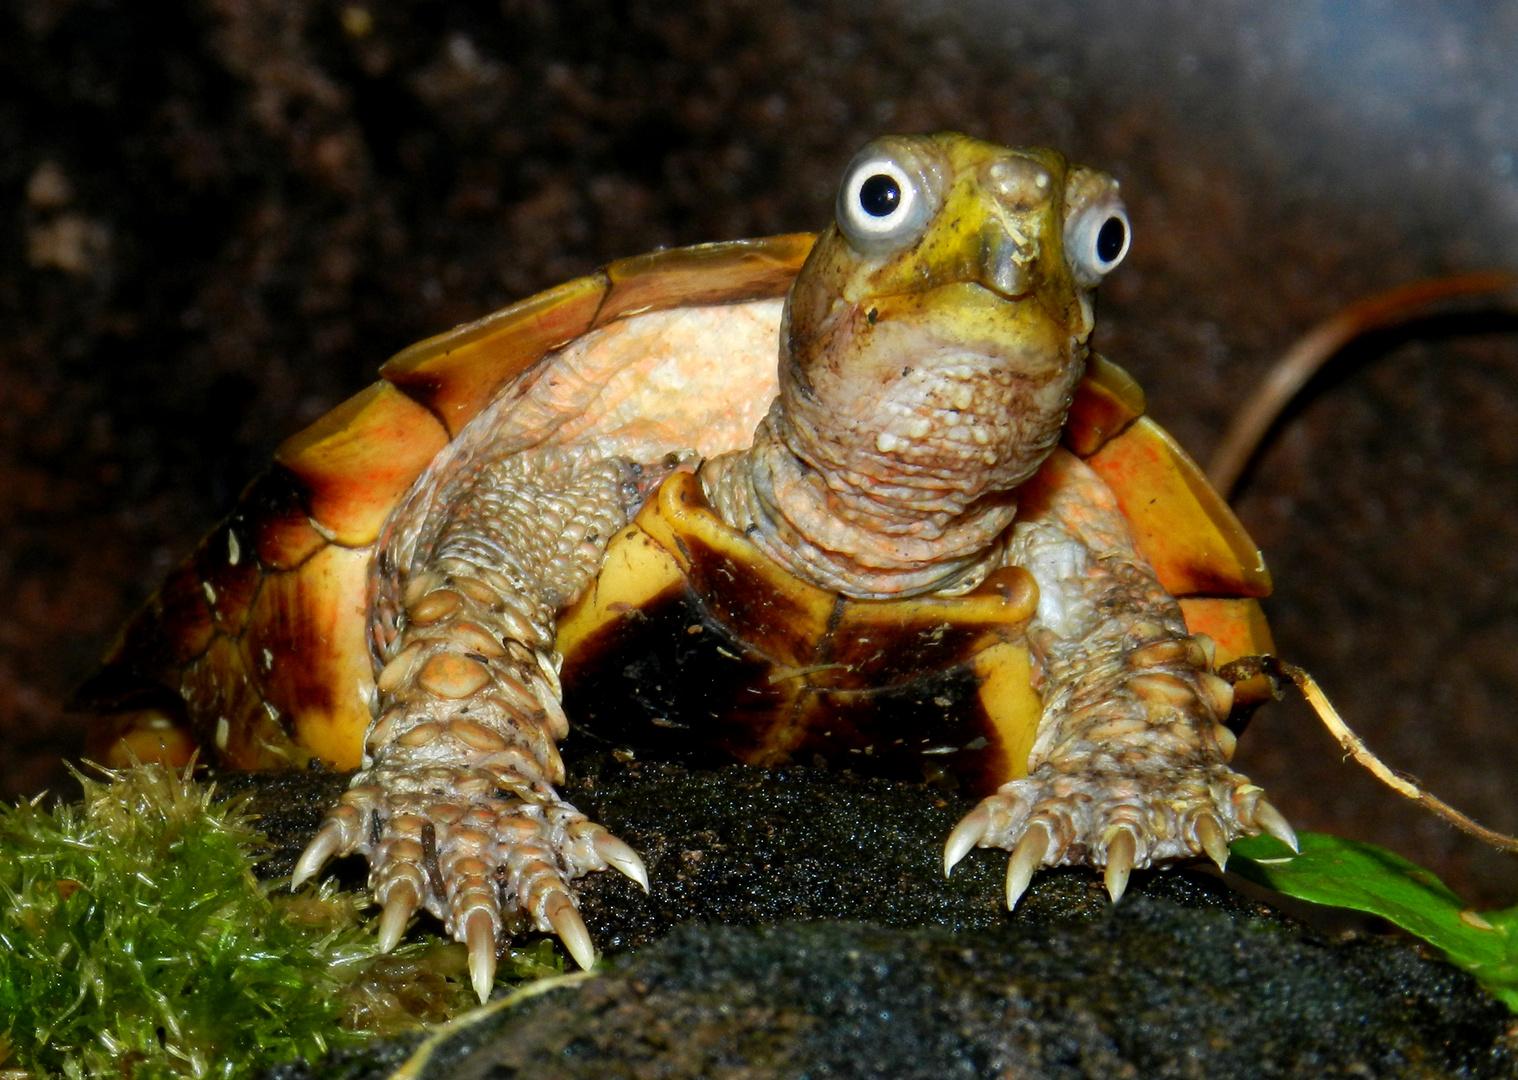 Zackenerdschildkröte